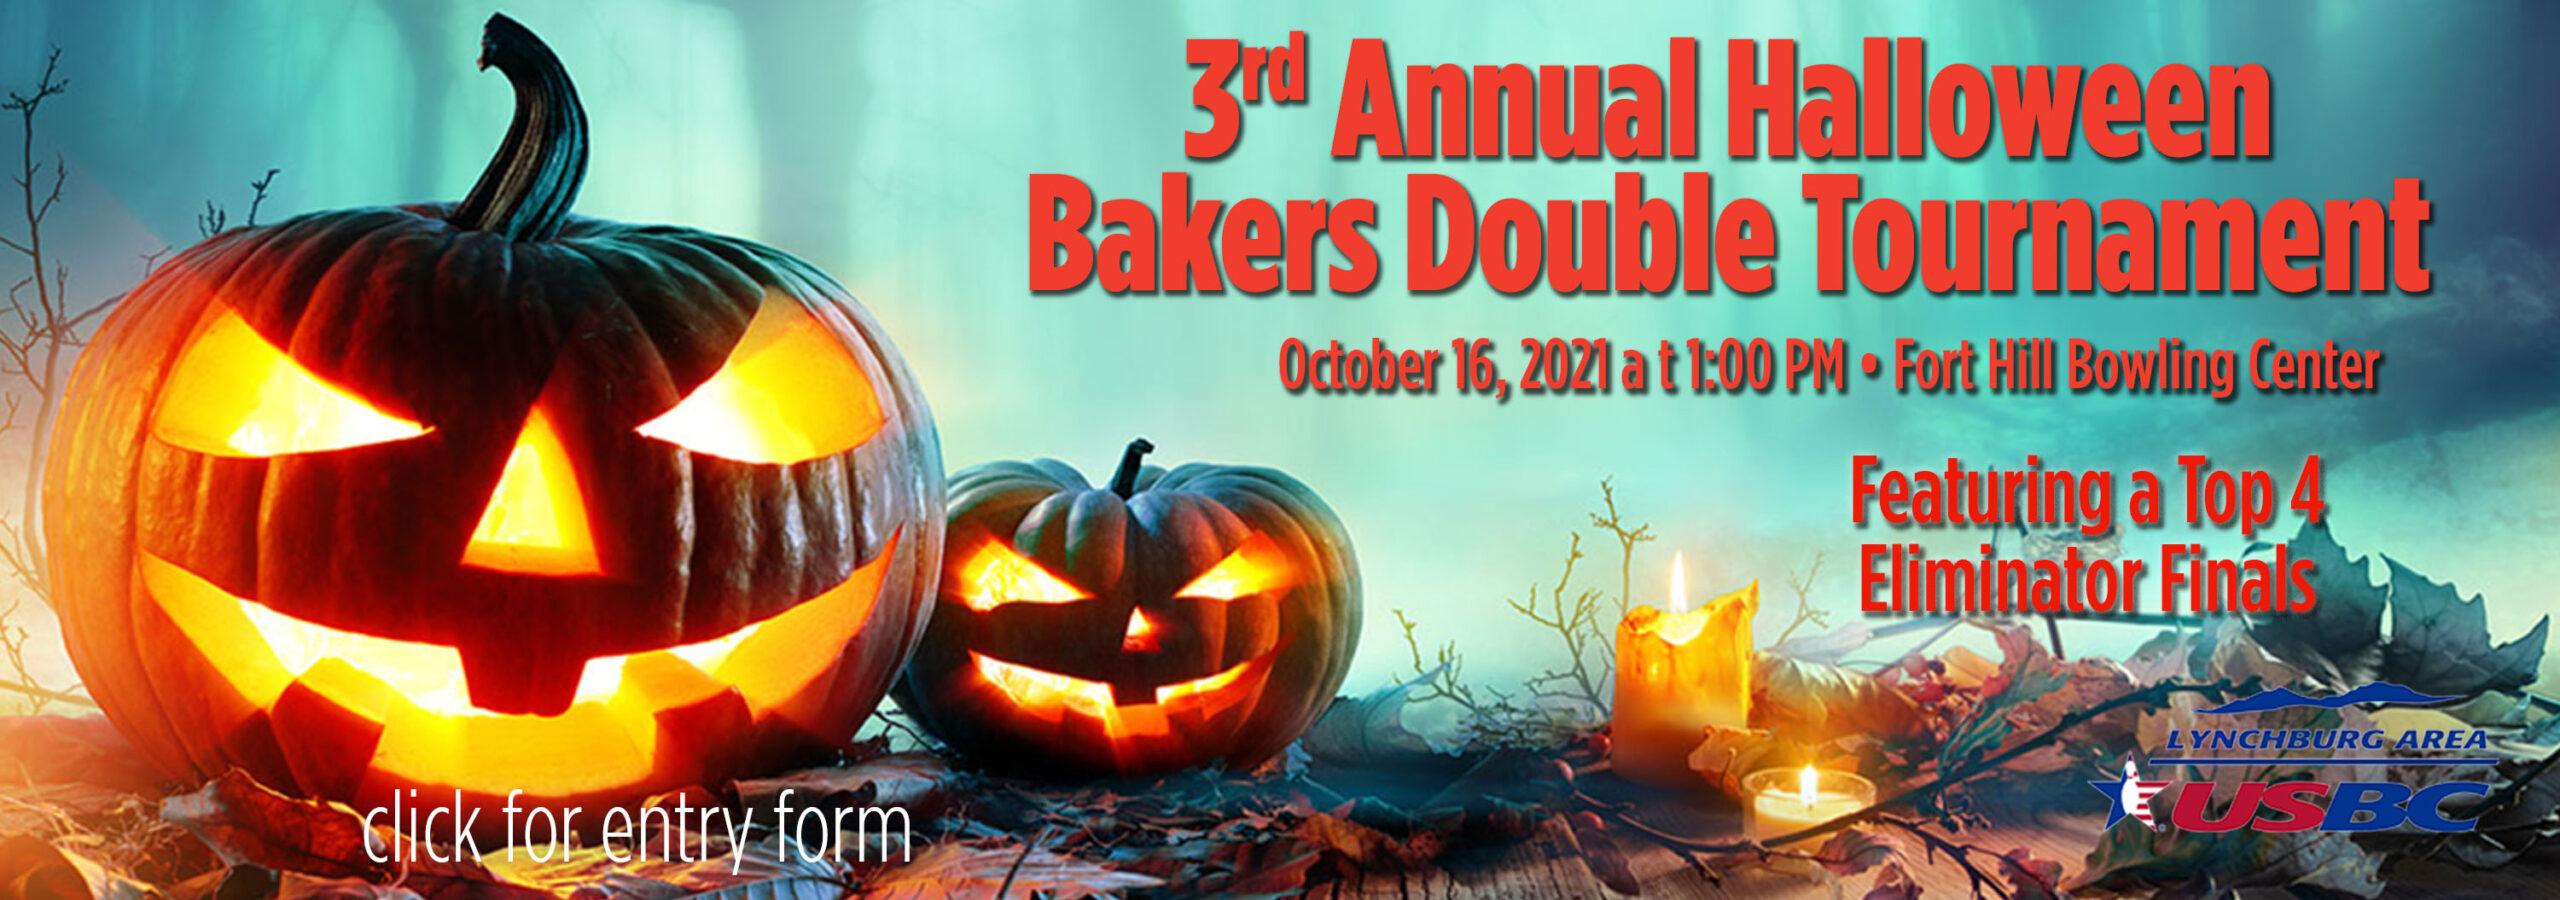 HalloweenBakersWebsite